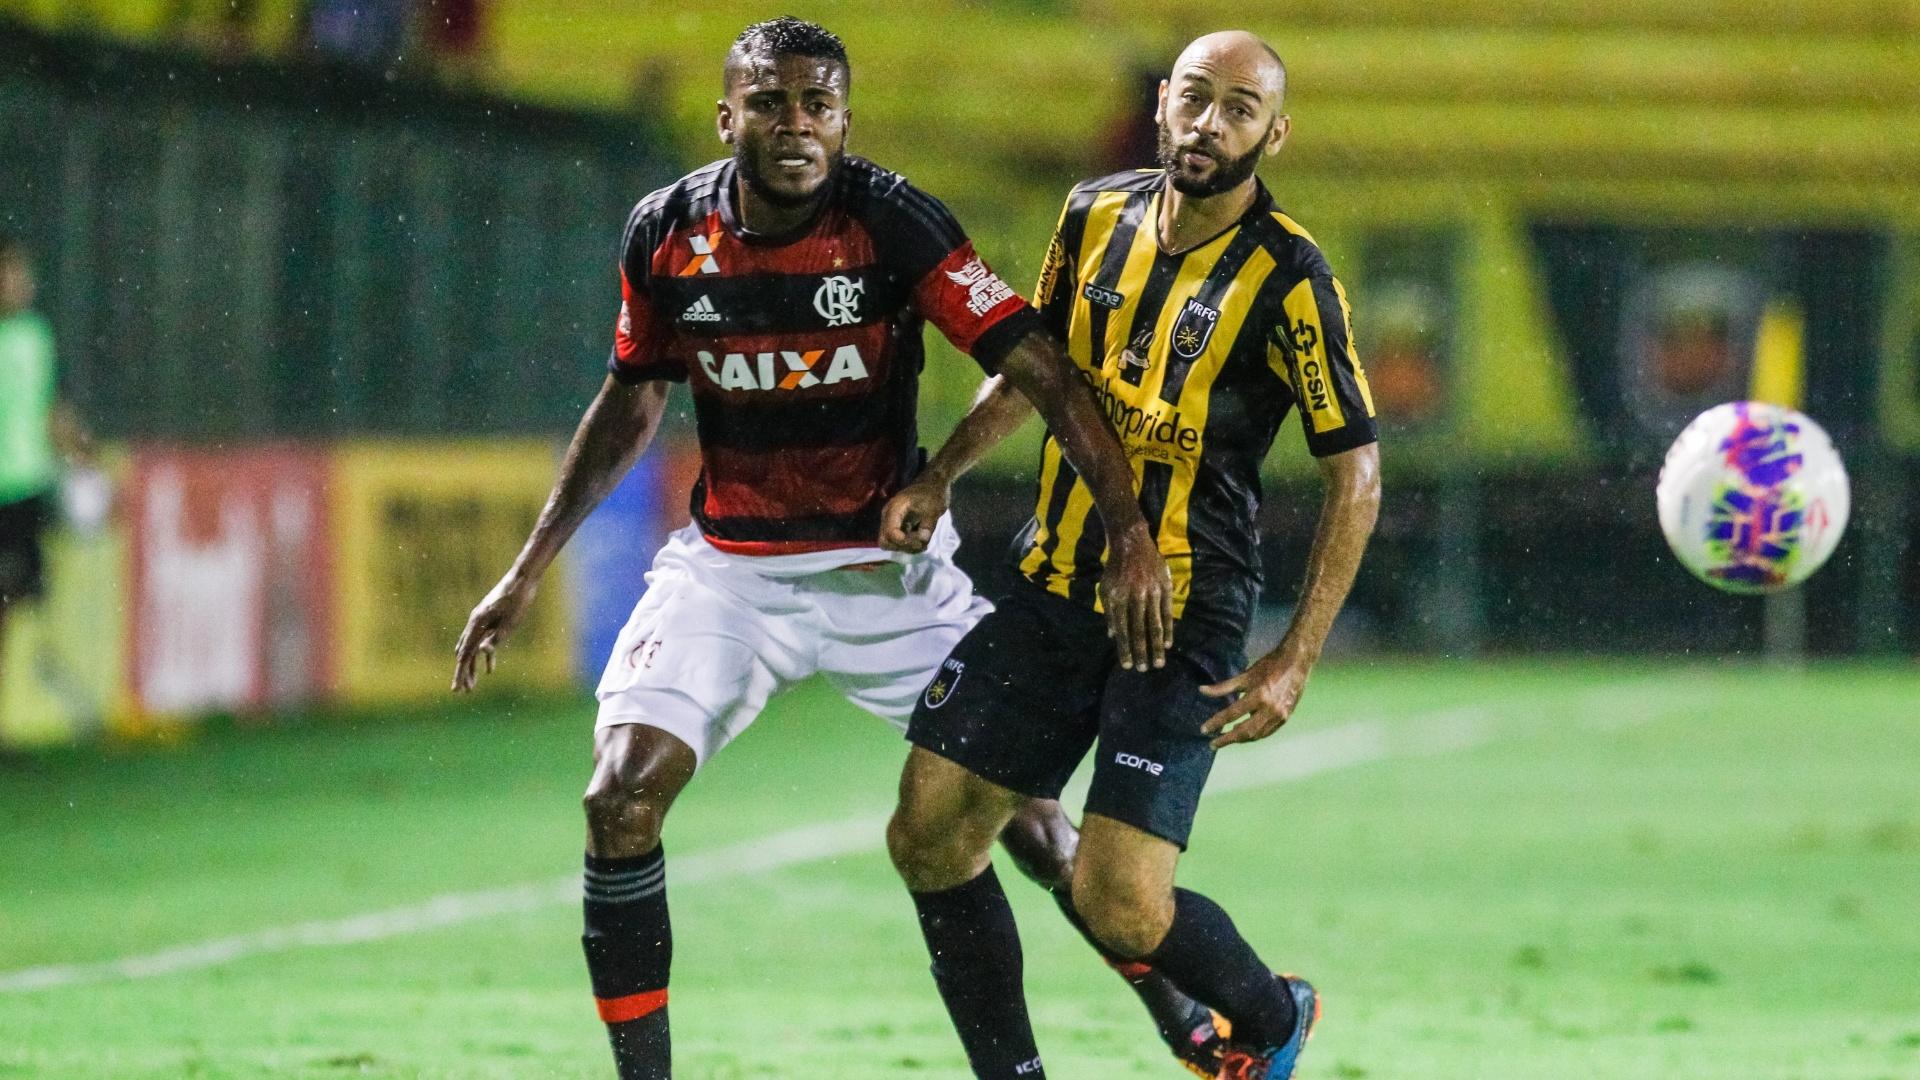 Cirino disputa a bola durante a partida do Flamengo contra o Volta Redonda